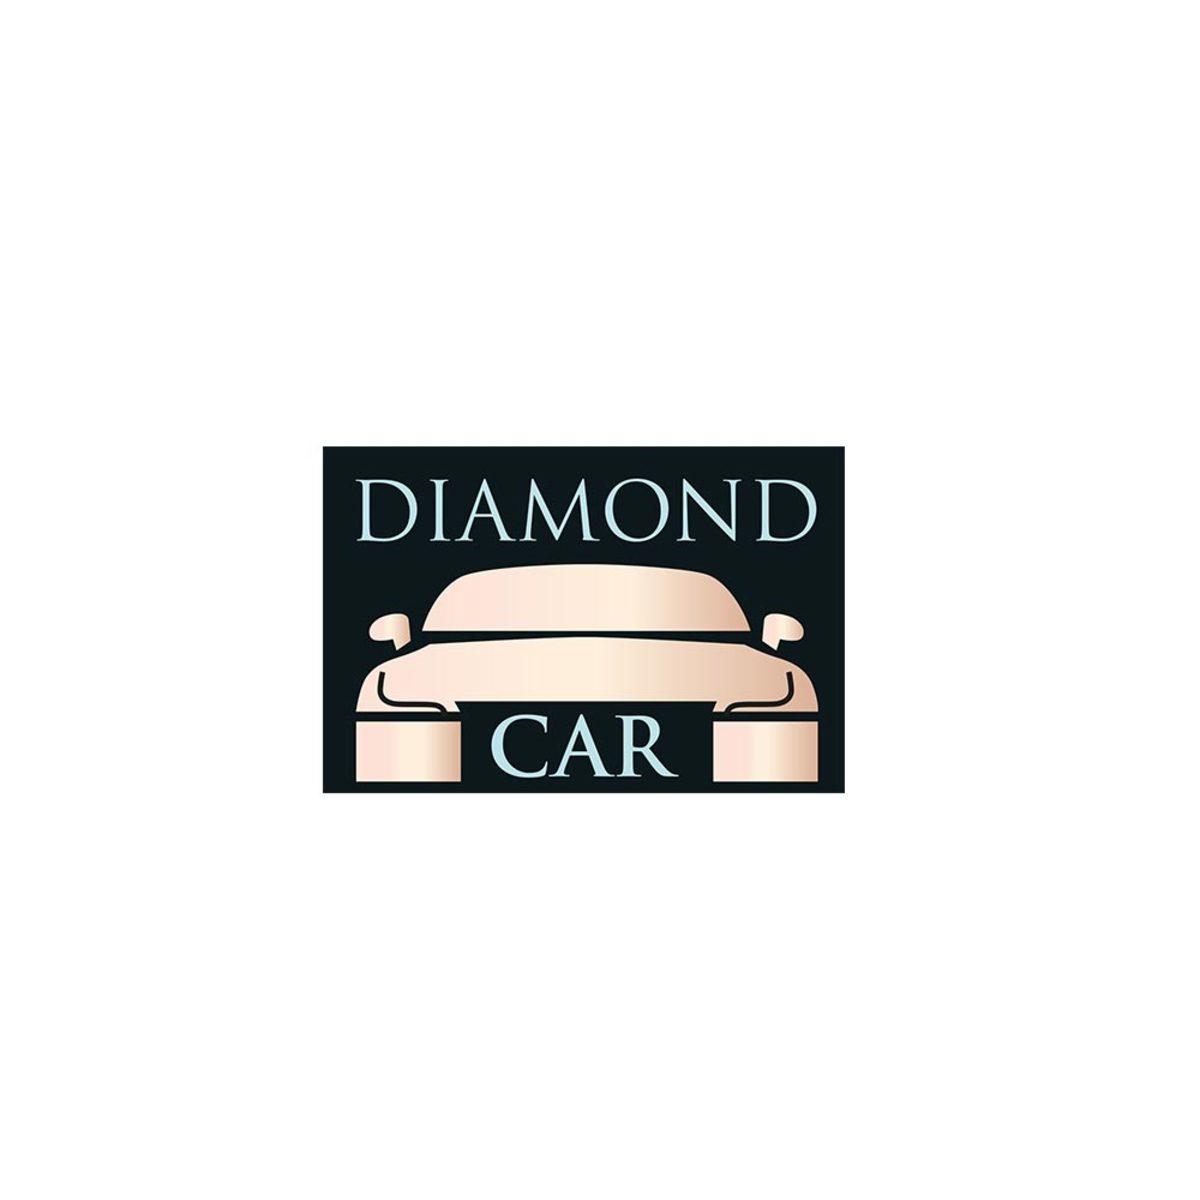 Bild 2 von Diamond Car Intelligentes Batterie-Ladegerät 6/12V, 4 A